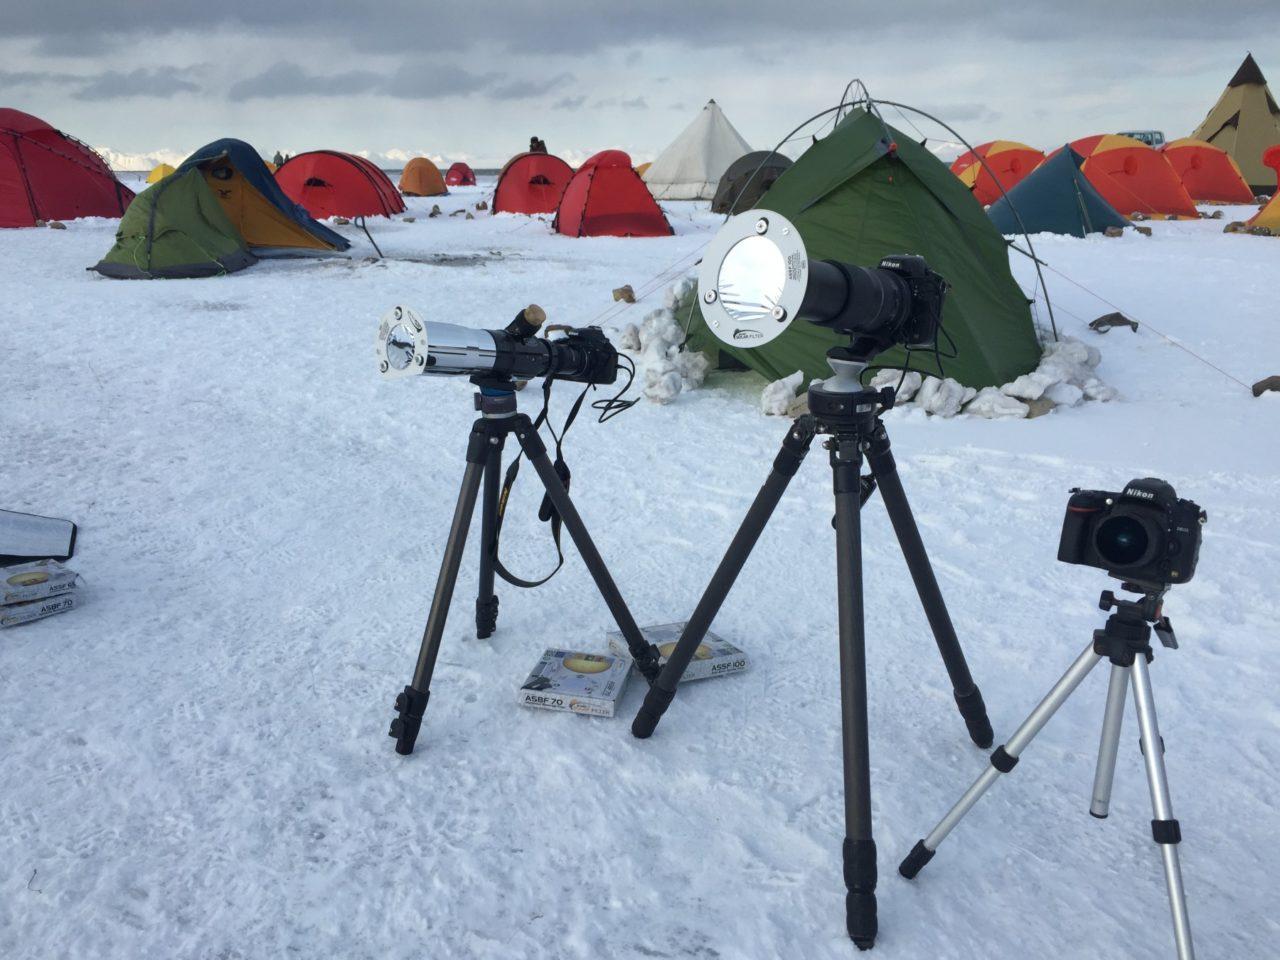 assf-astrosolar-spotting-scope-filter-od-50-50mm-150mm-cdb[1]